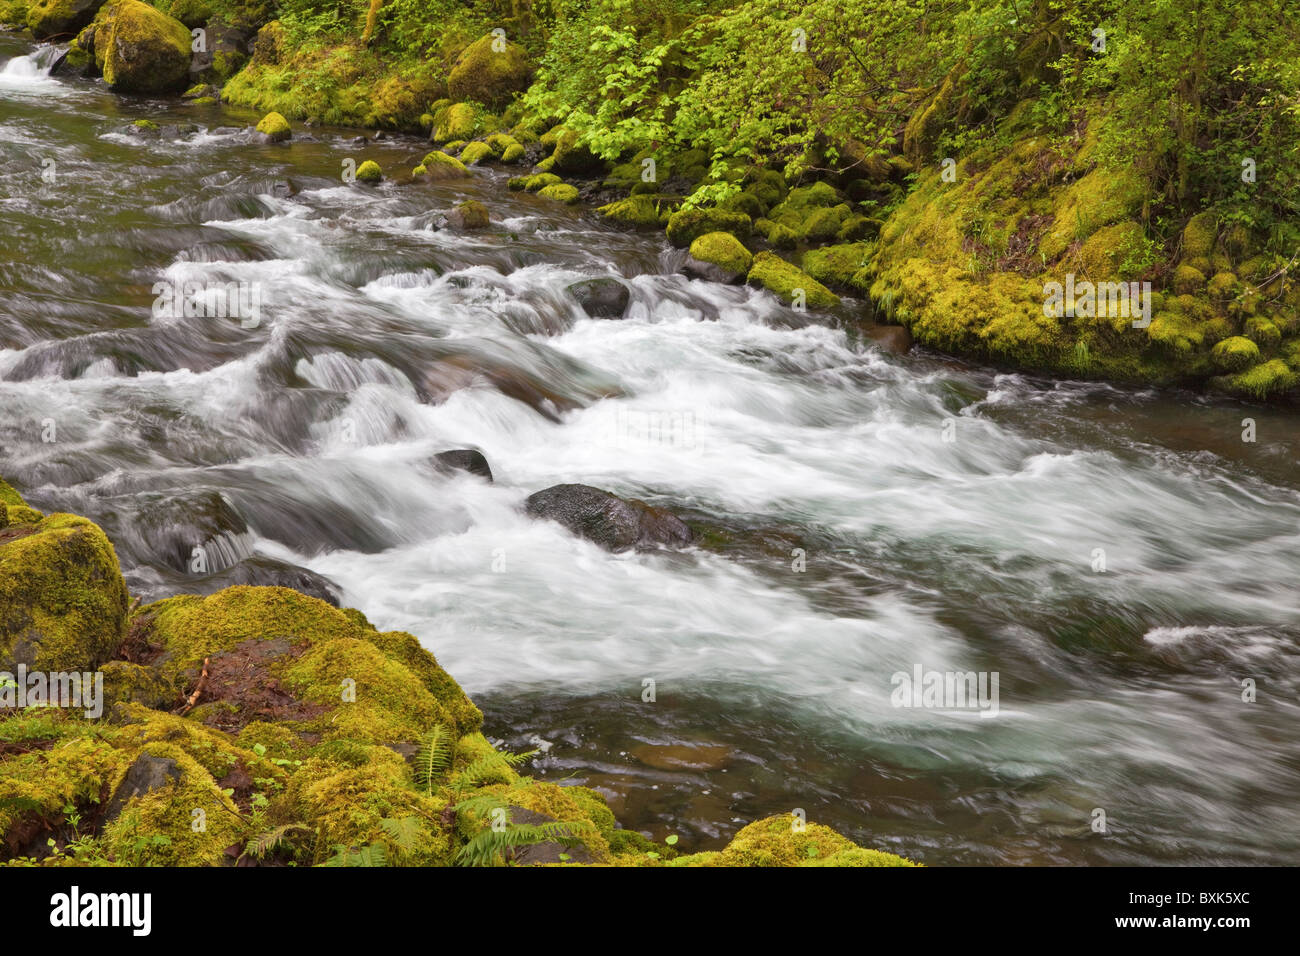 Tanner Creek, Columbia River Gorge National Scenic Area, Oregon, USA - Stock Image